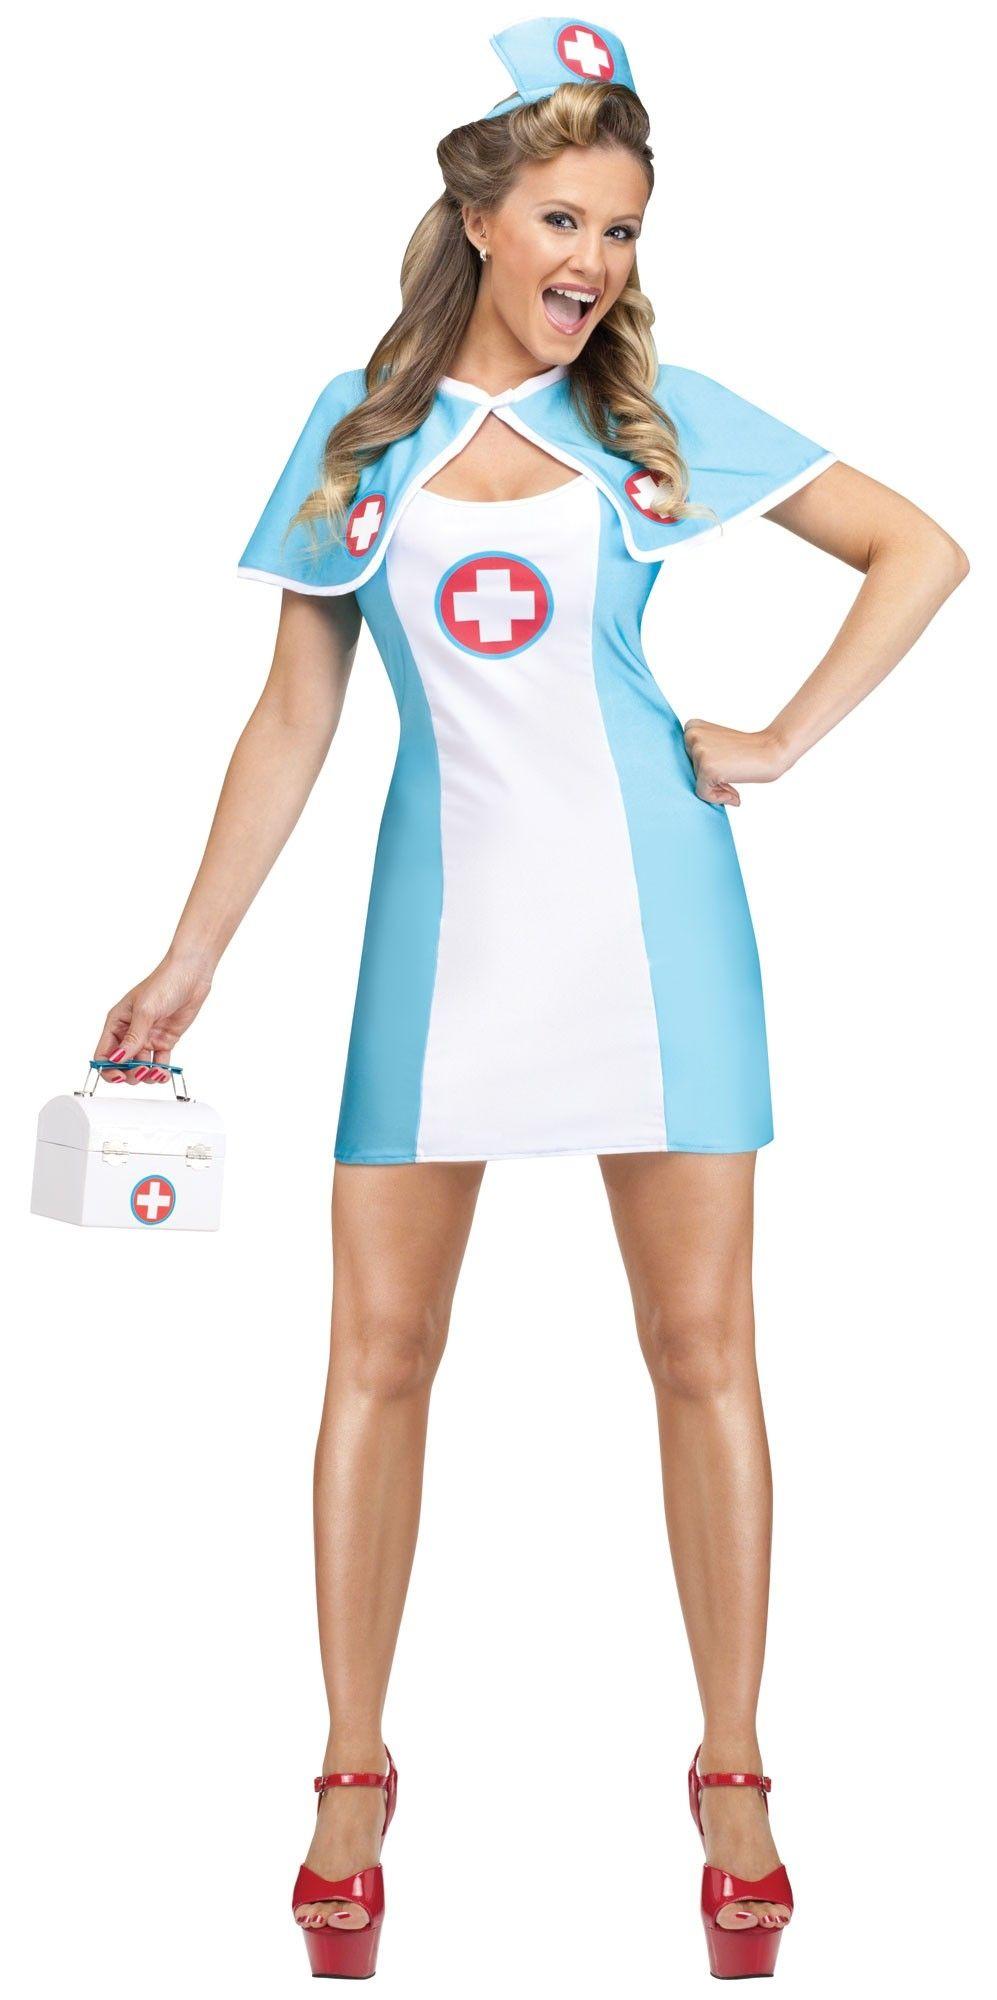 Костюм Пин-ап медсестры (46-48) костюм внимательной медсестры 42 46